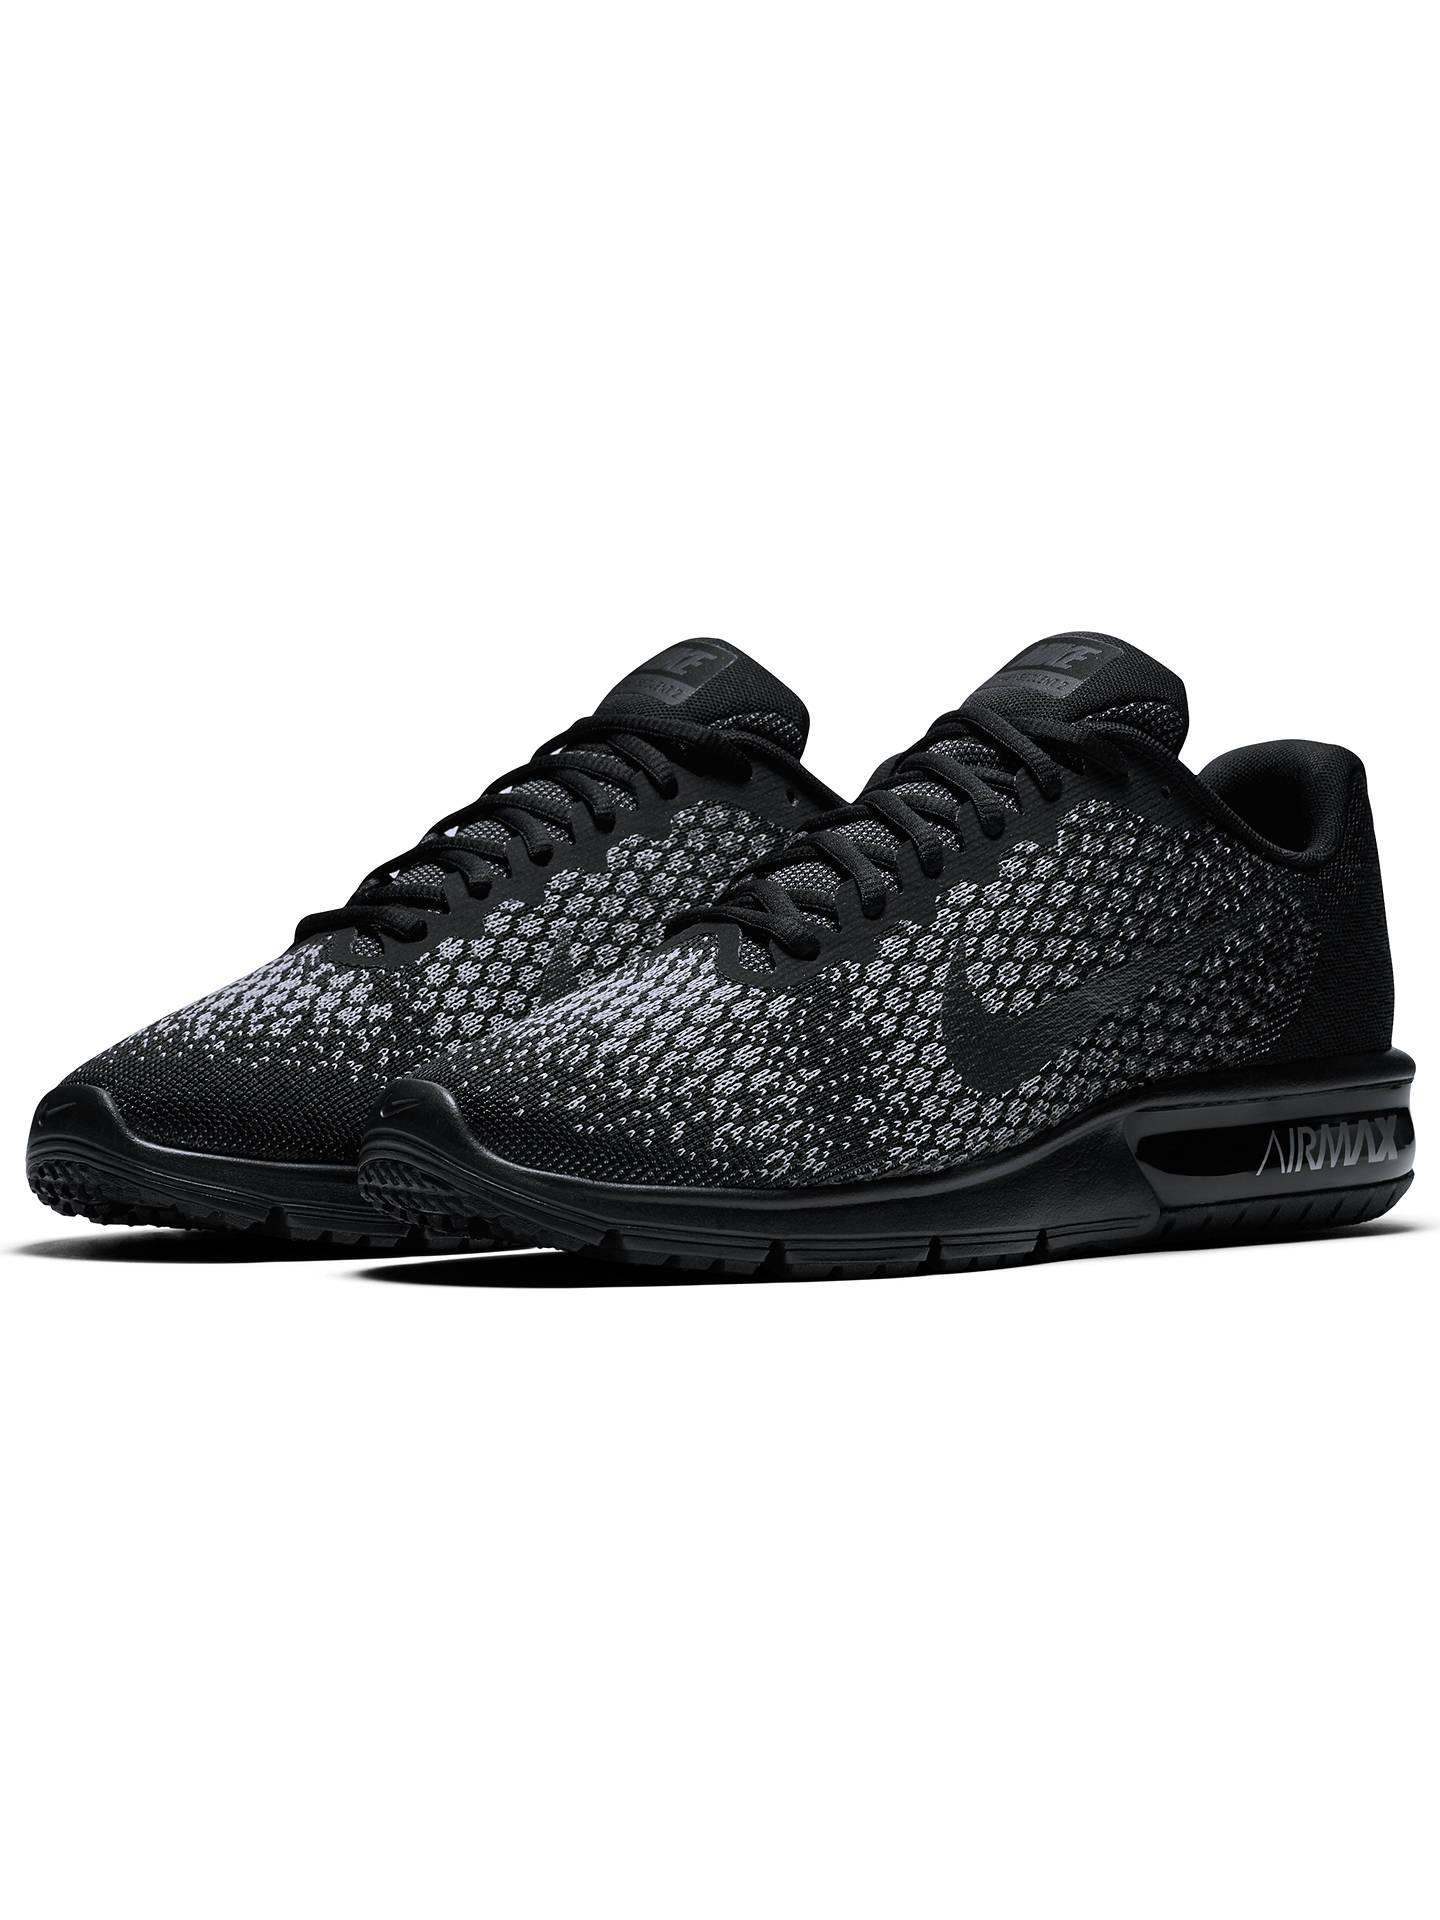 Estándar Inspirar patrulla  Nike Air Max Sequent 2 Men's Running Shoes, Black/Wolf Grey at John Lewis &  Partners